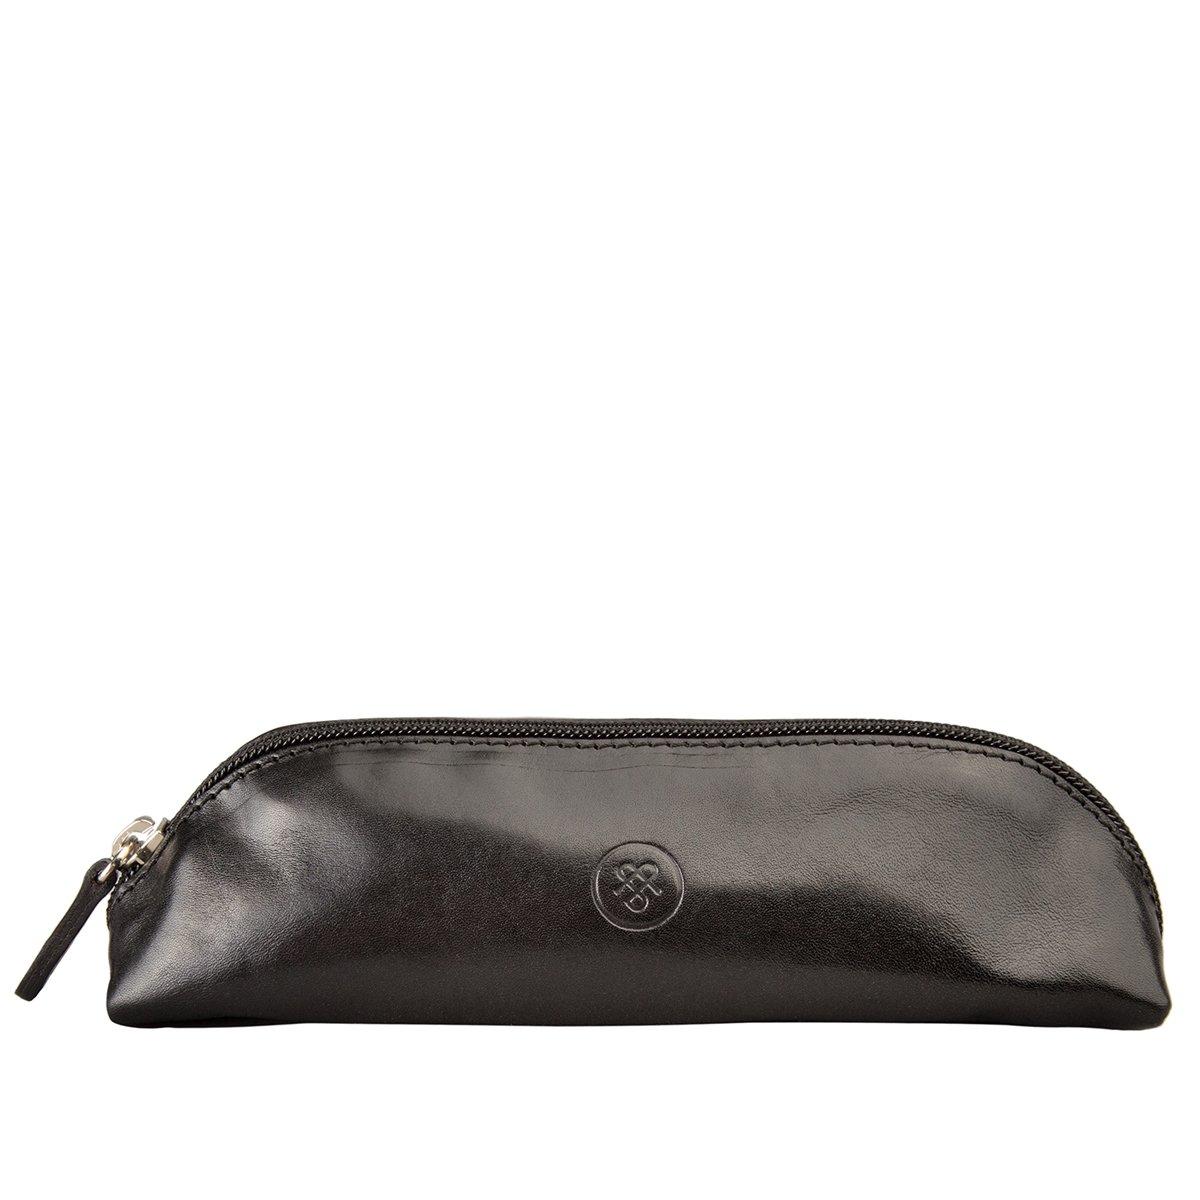 Maxwell Scott Personalized Luxury Italian Black Leather Pen / Pencil Case (Felice) by Maxwell Scott Bags (Image #1)